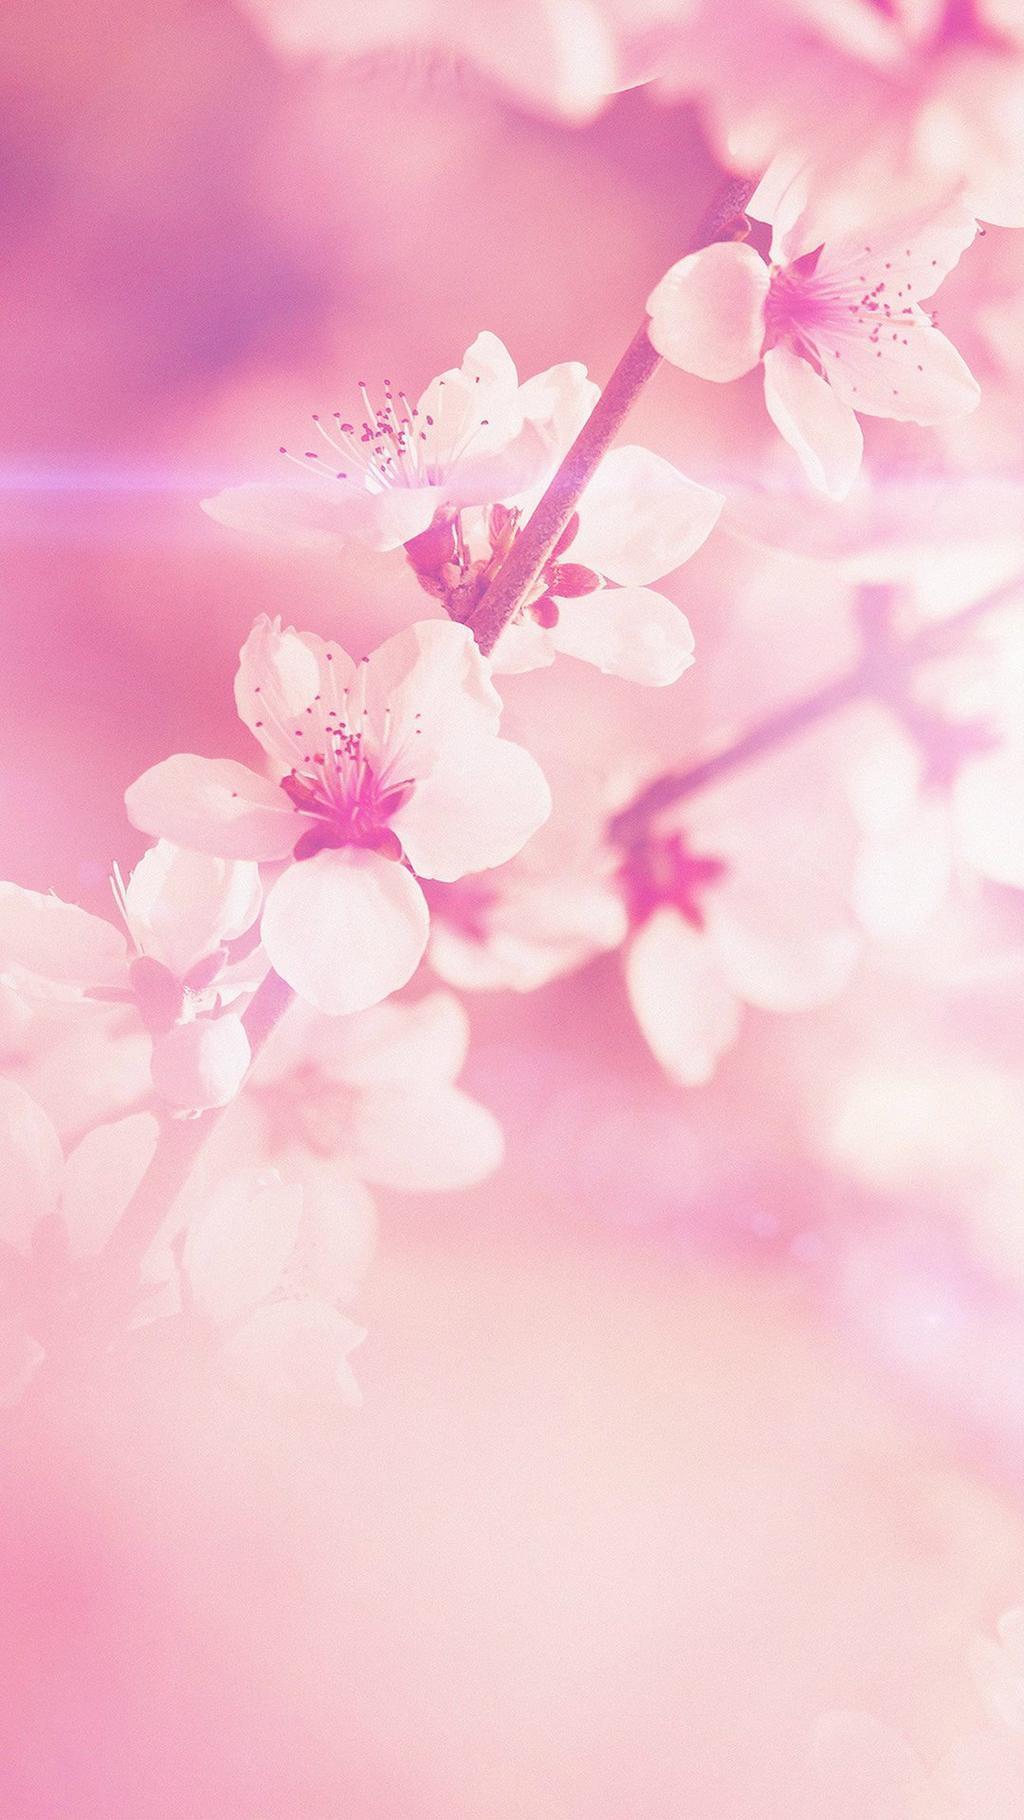 Wallpaper tumblr hd rosa